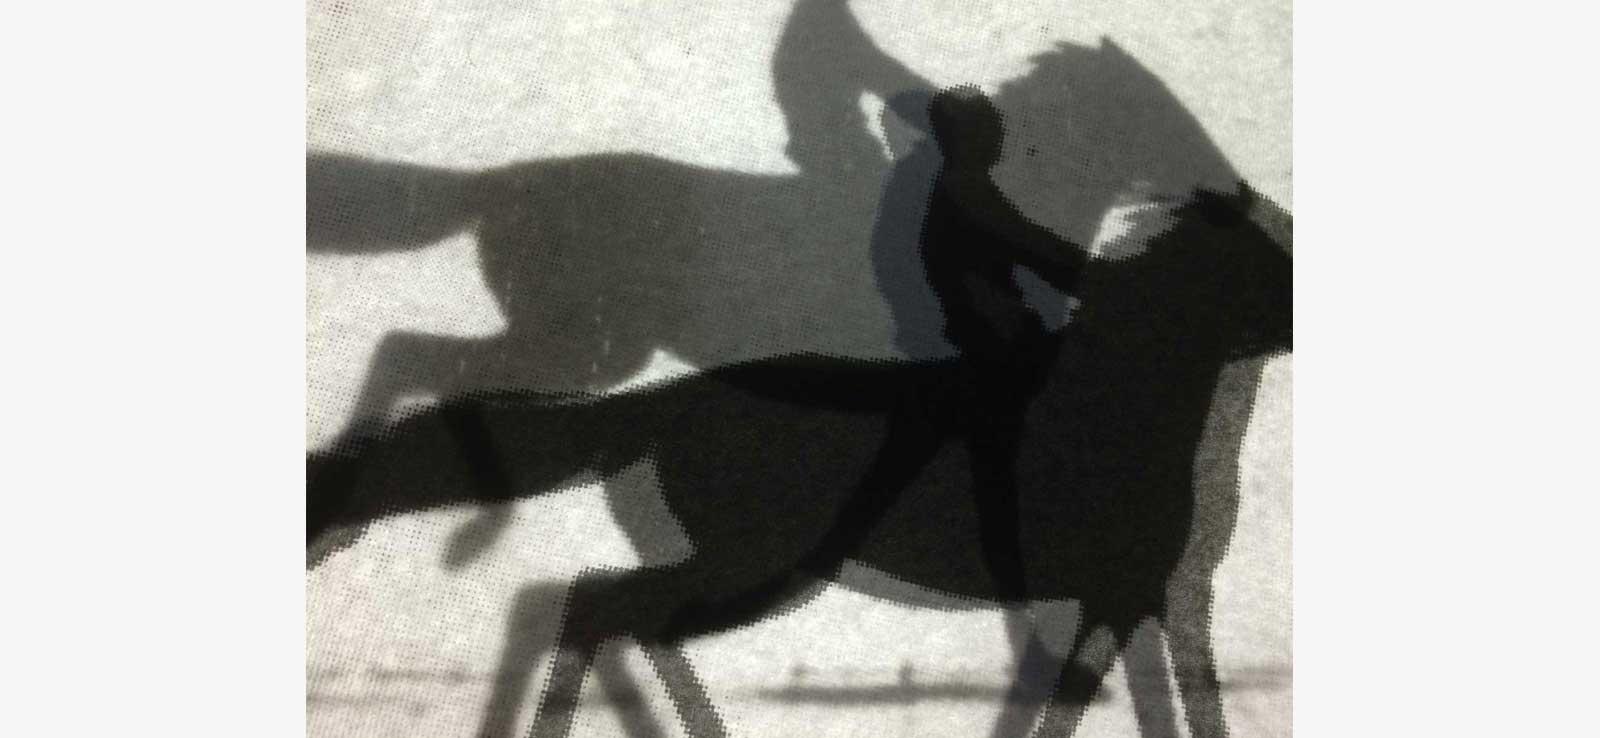 Antoni-Pinent-film-Still-Frame-analog-QR-CODE-animation